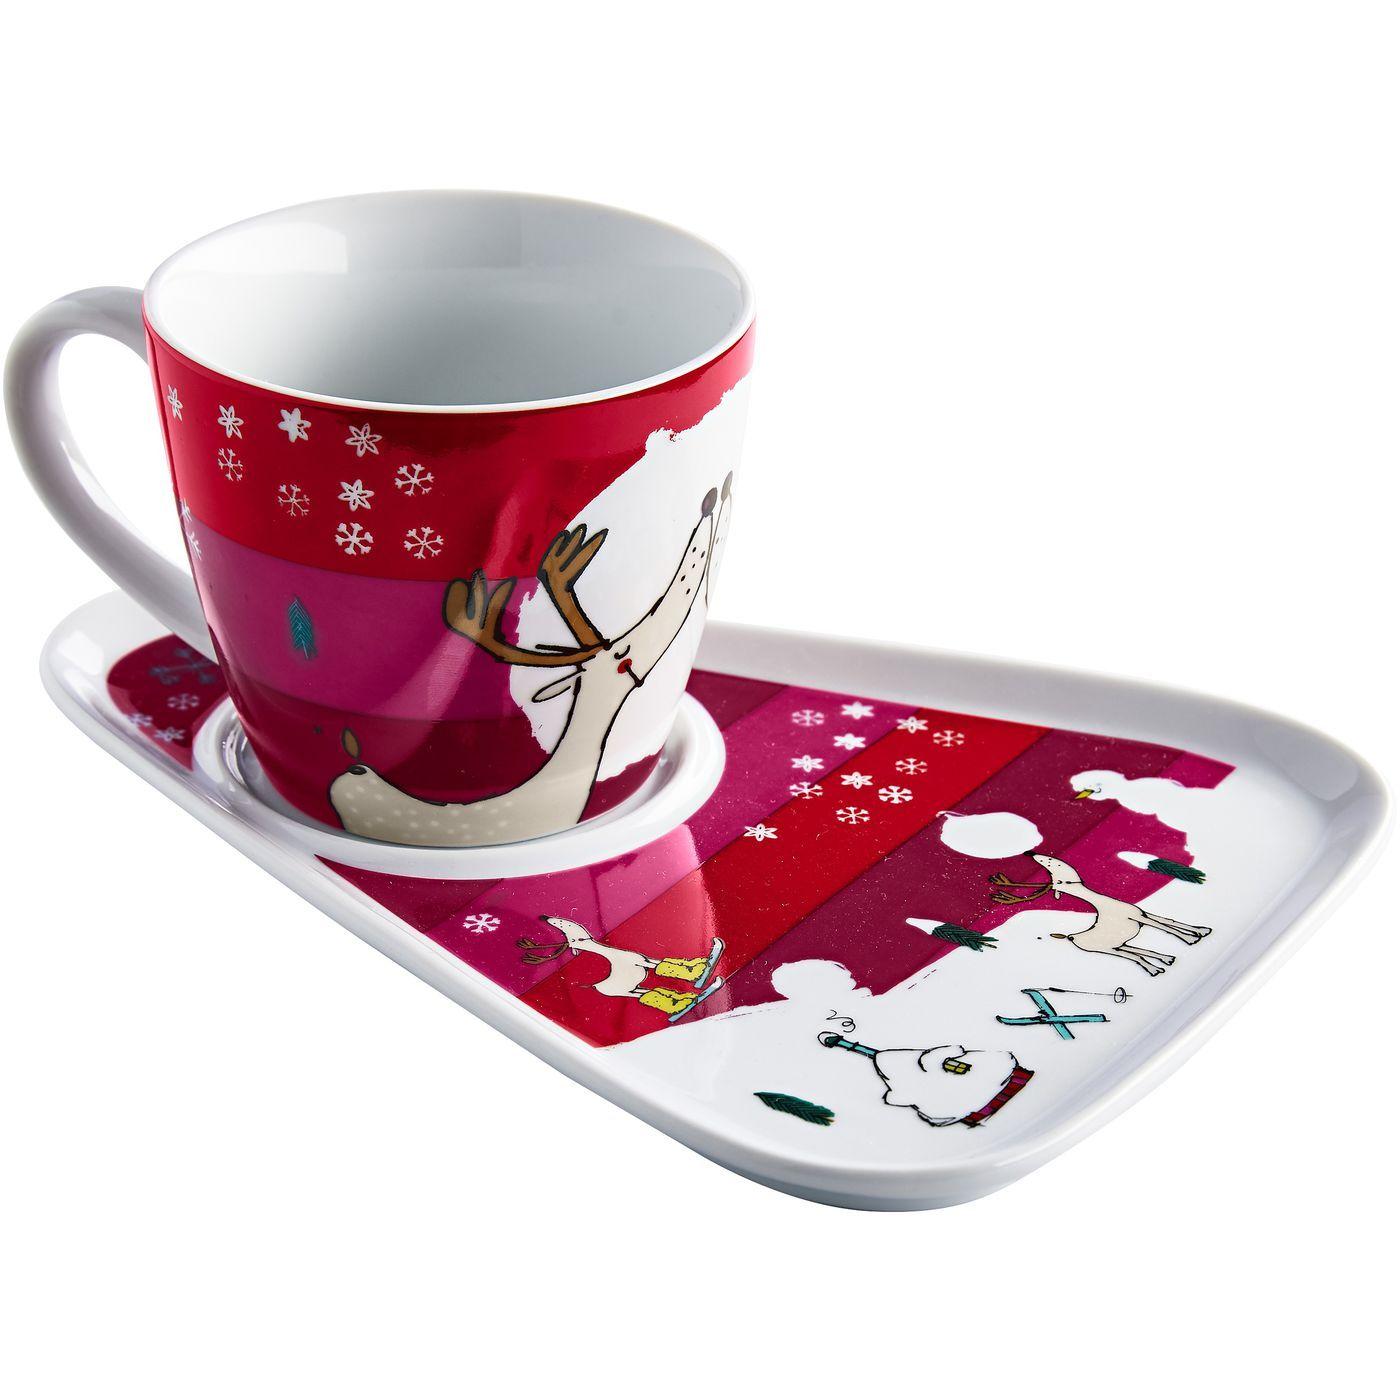 Porzellan Tassen Set Jako O Porzellan Tasse Tassen Porzellan